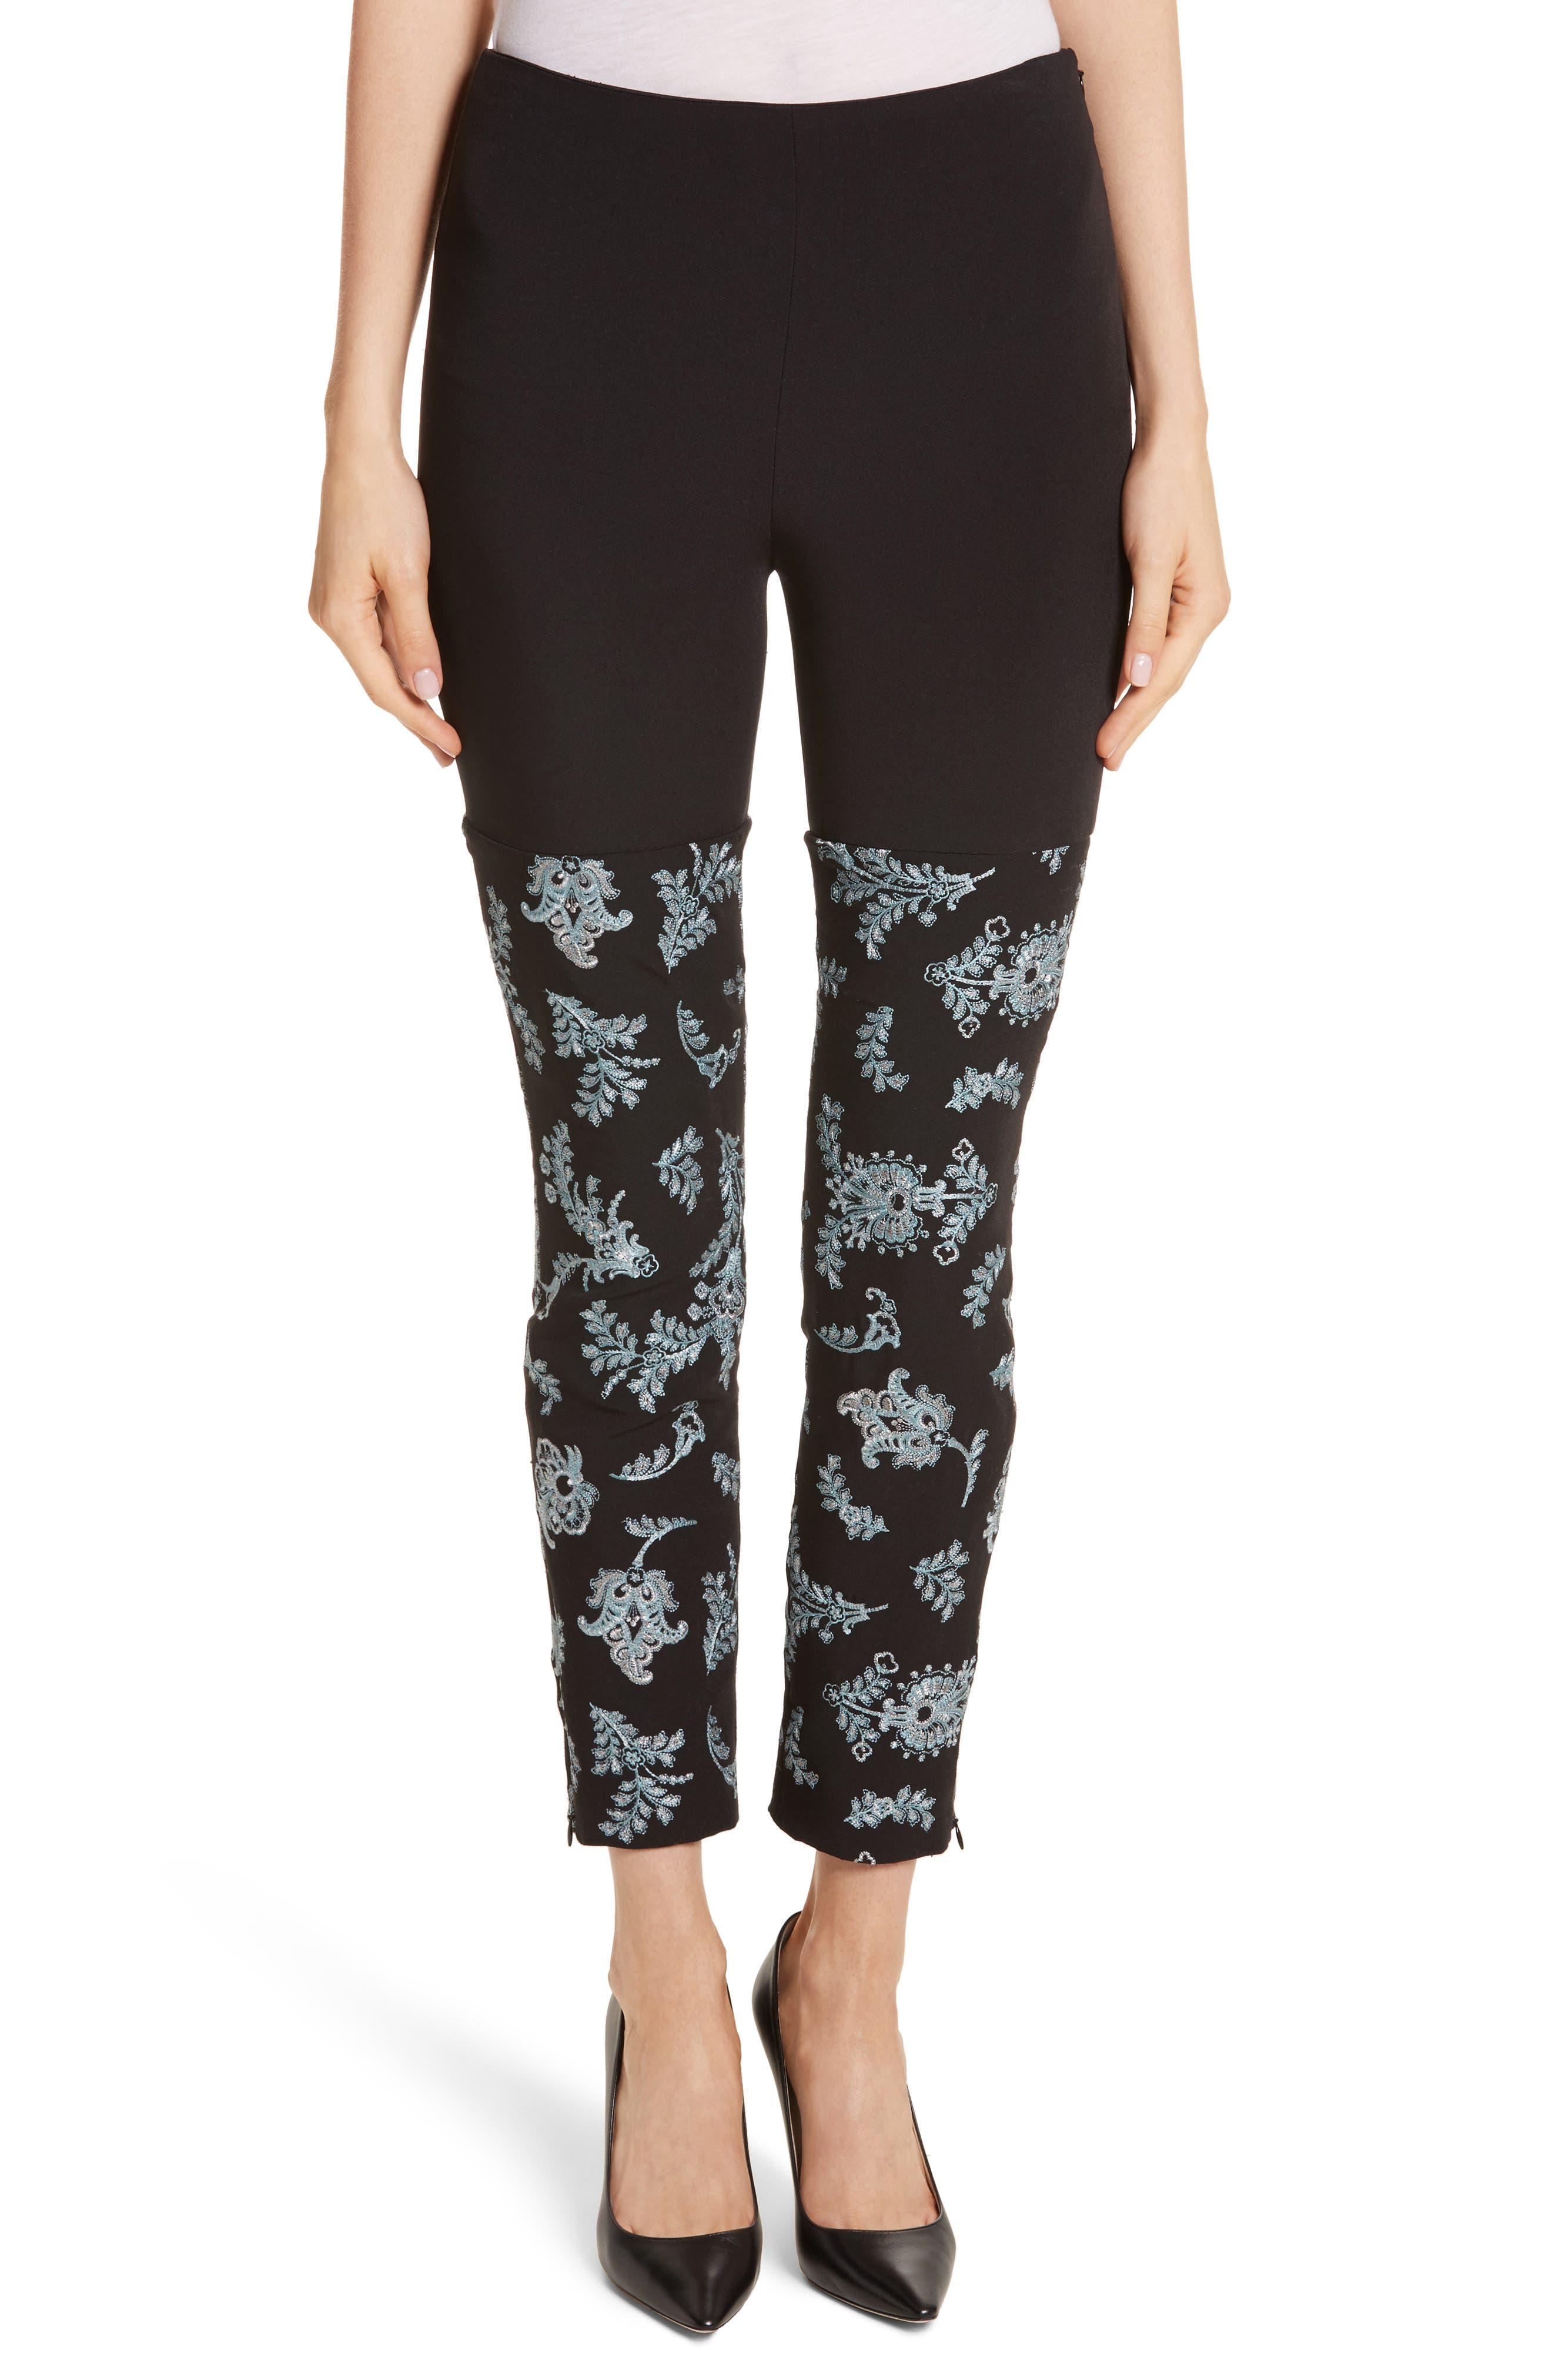 Marin Embroidered Leggings,                             Main thumbnail 1, color,                             Black/ Silver/ Sunshower